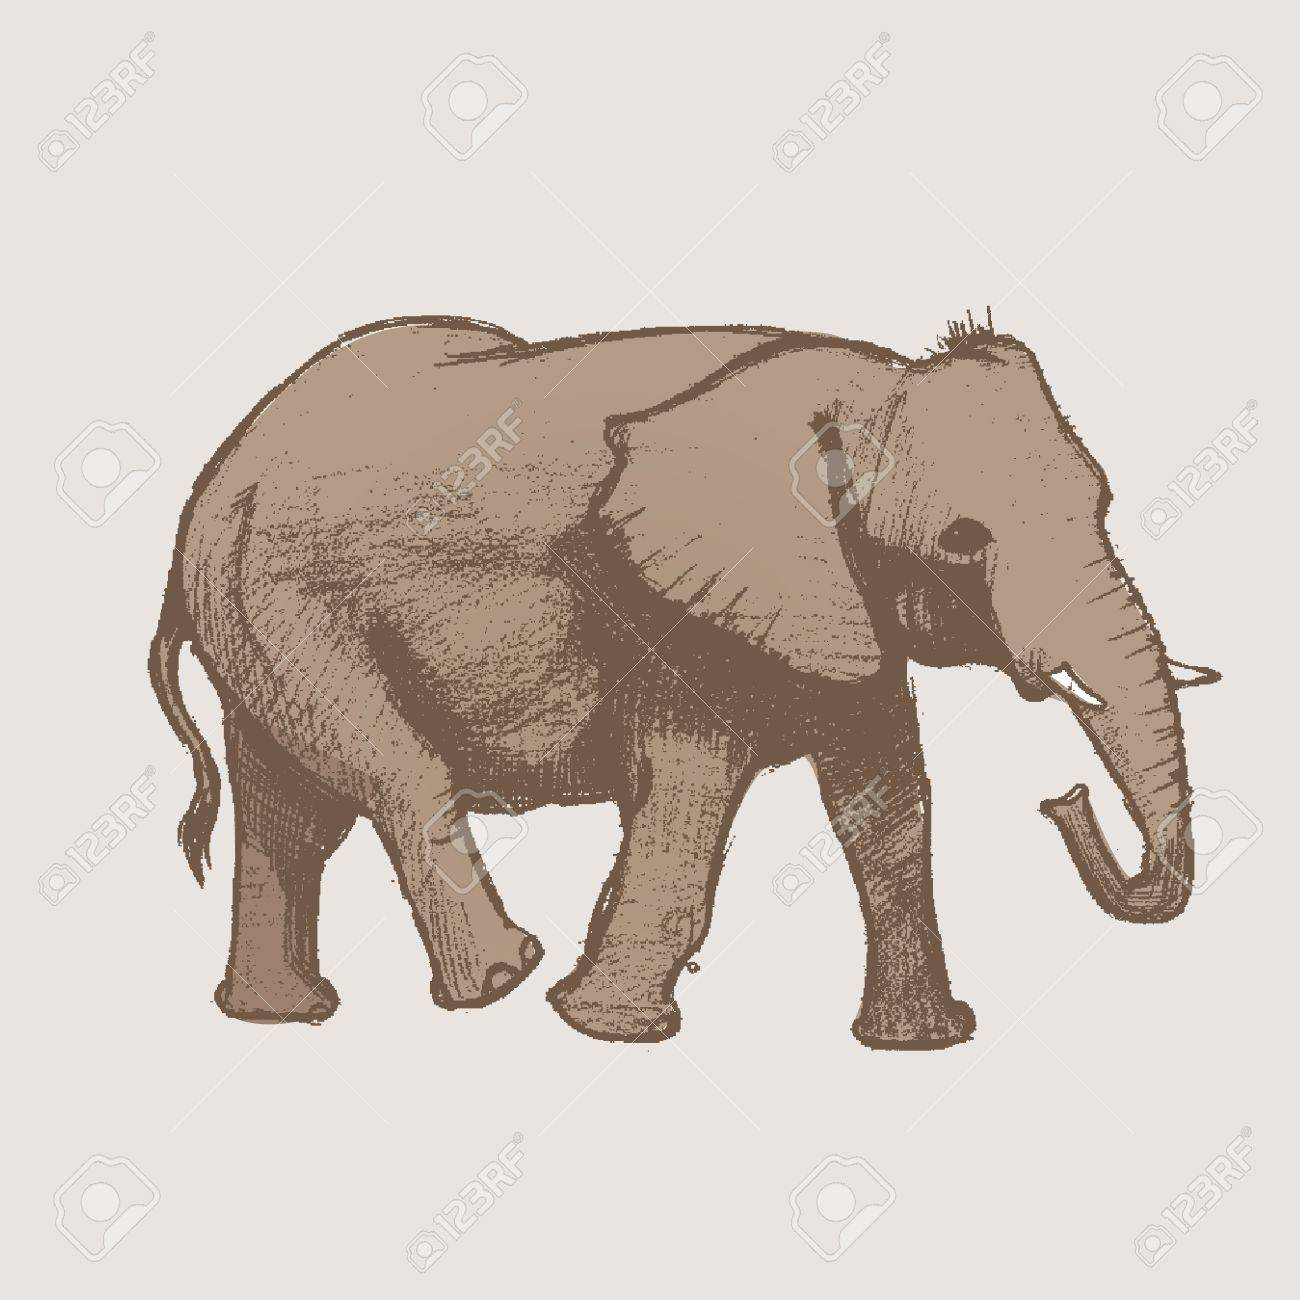 Elephant Art drawing Stock Vector - 14825906